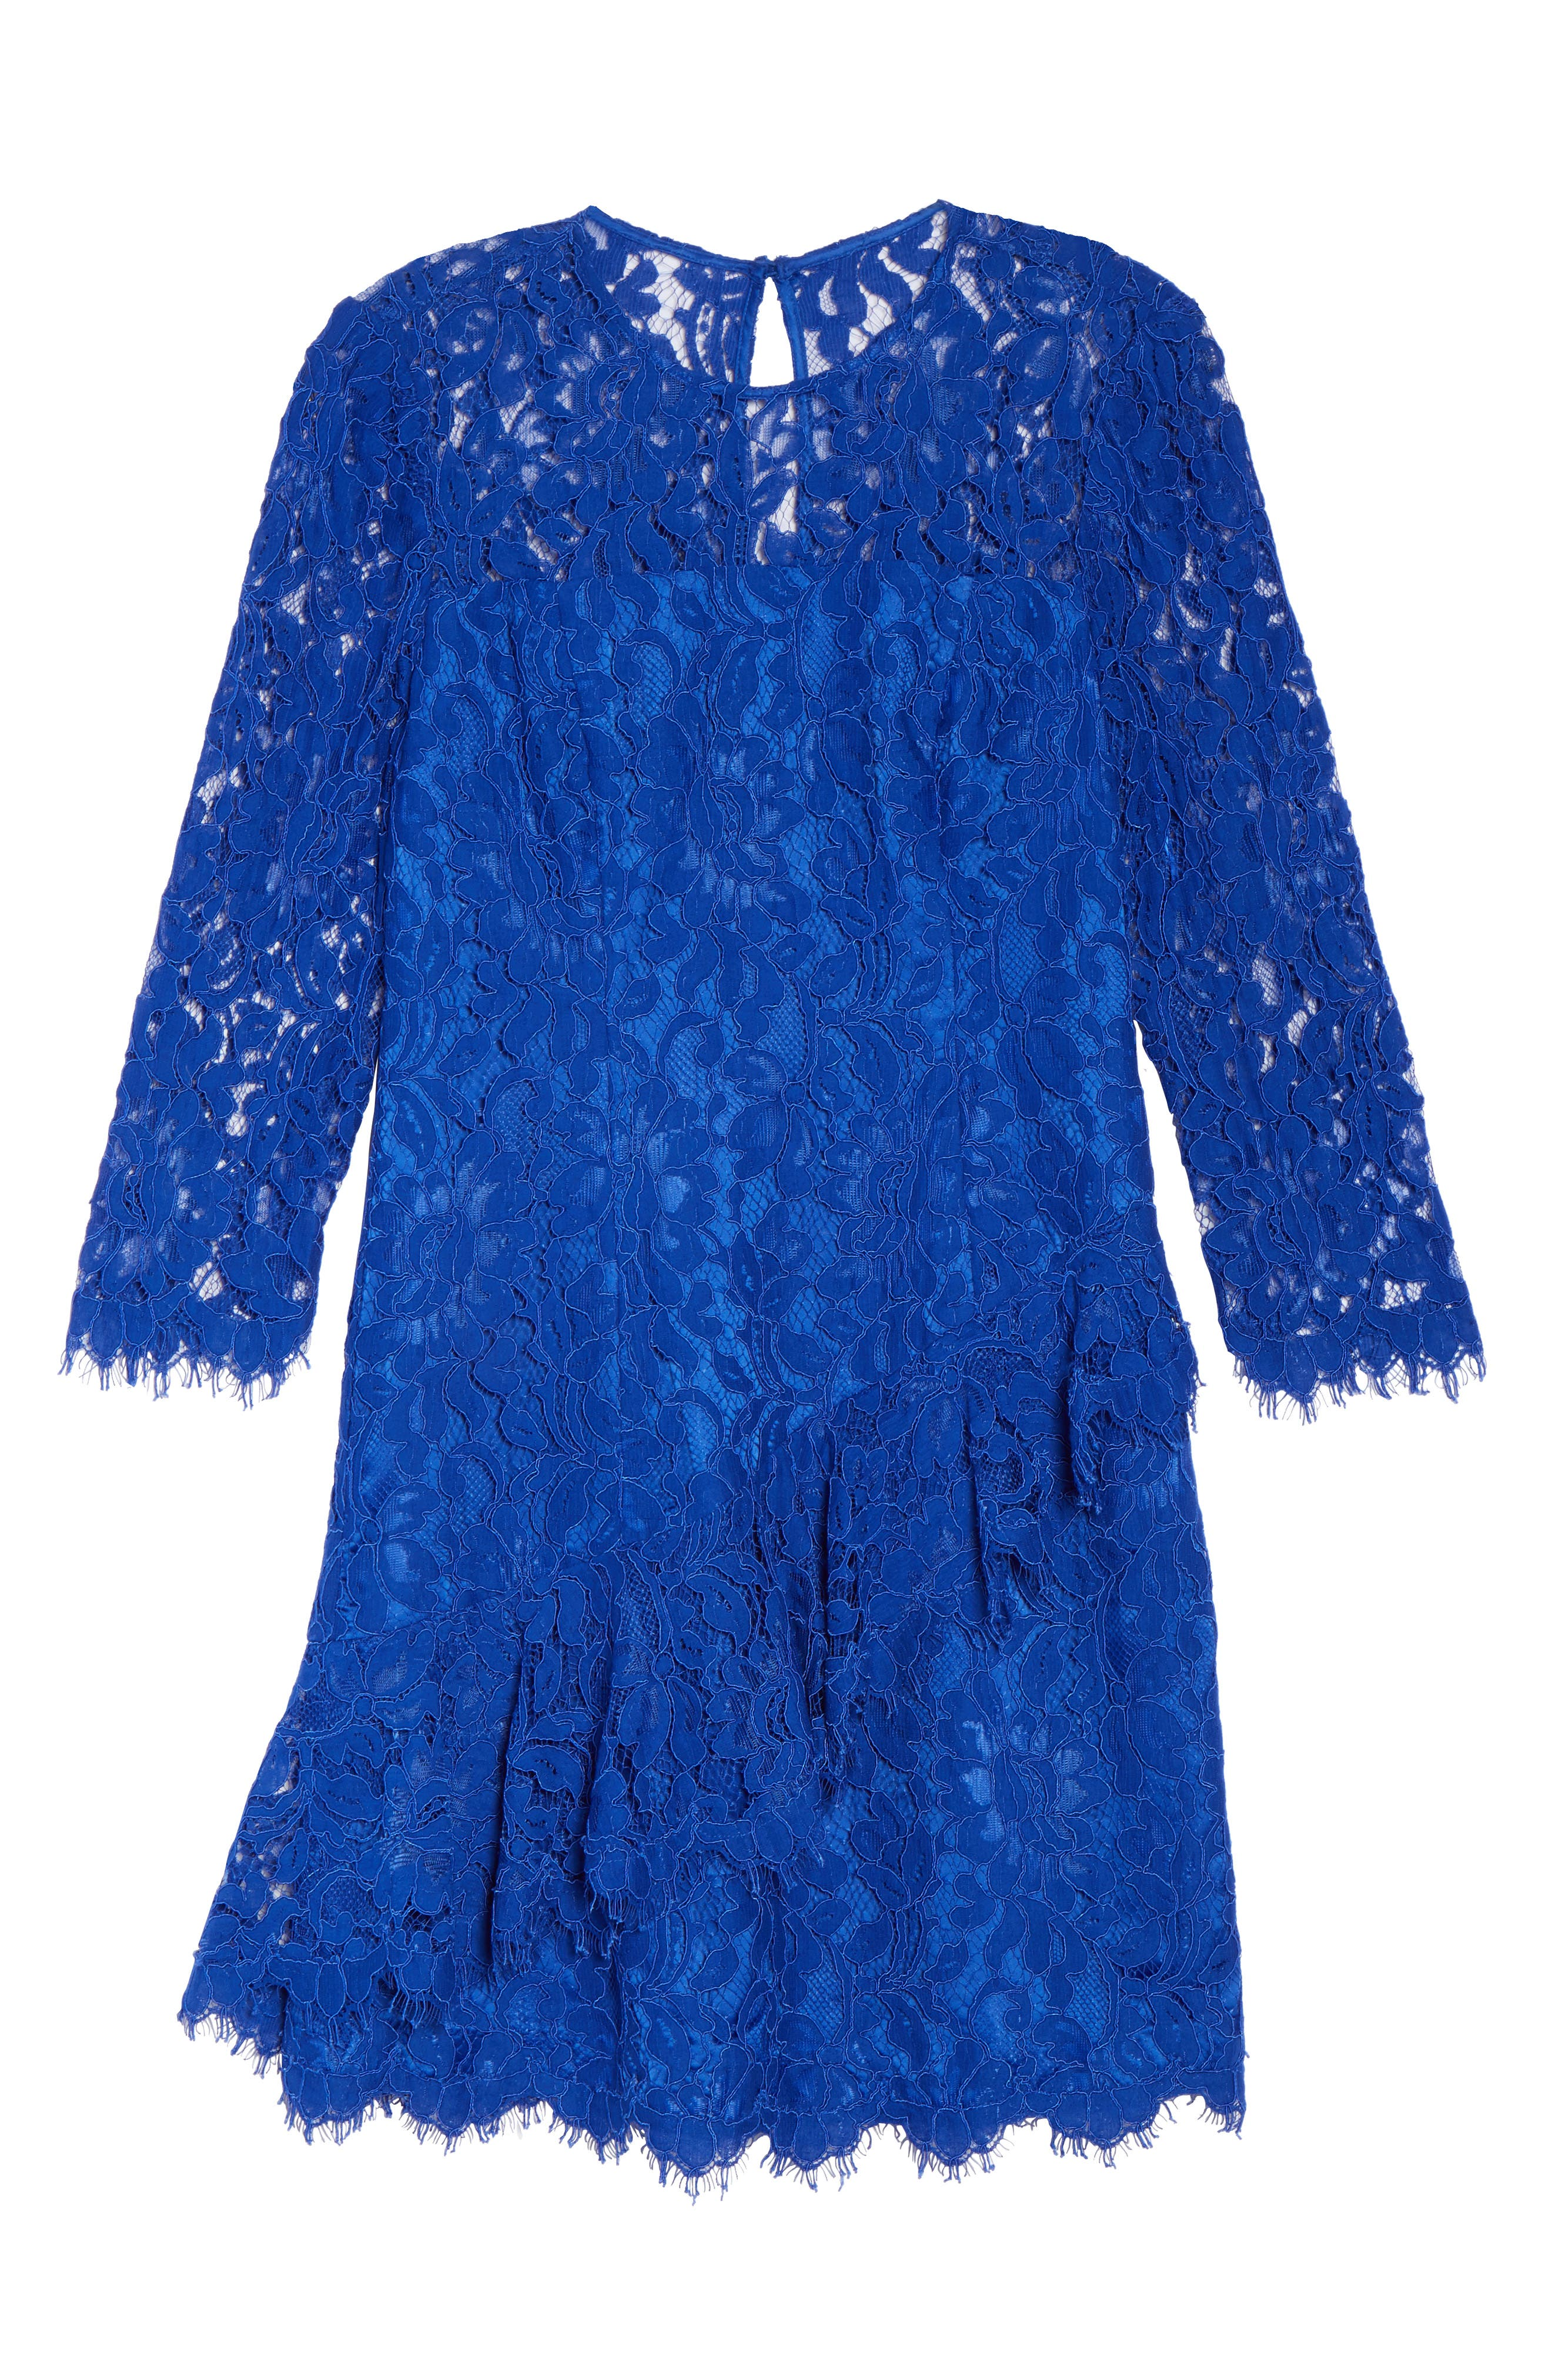 Lace Fit & Flare Dress,                             Alternate thumbnail 6, color,                             430